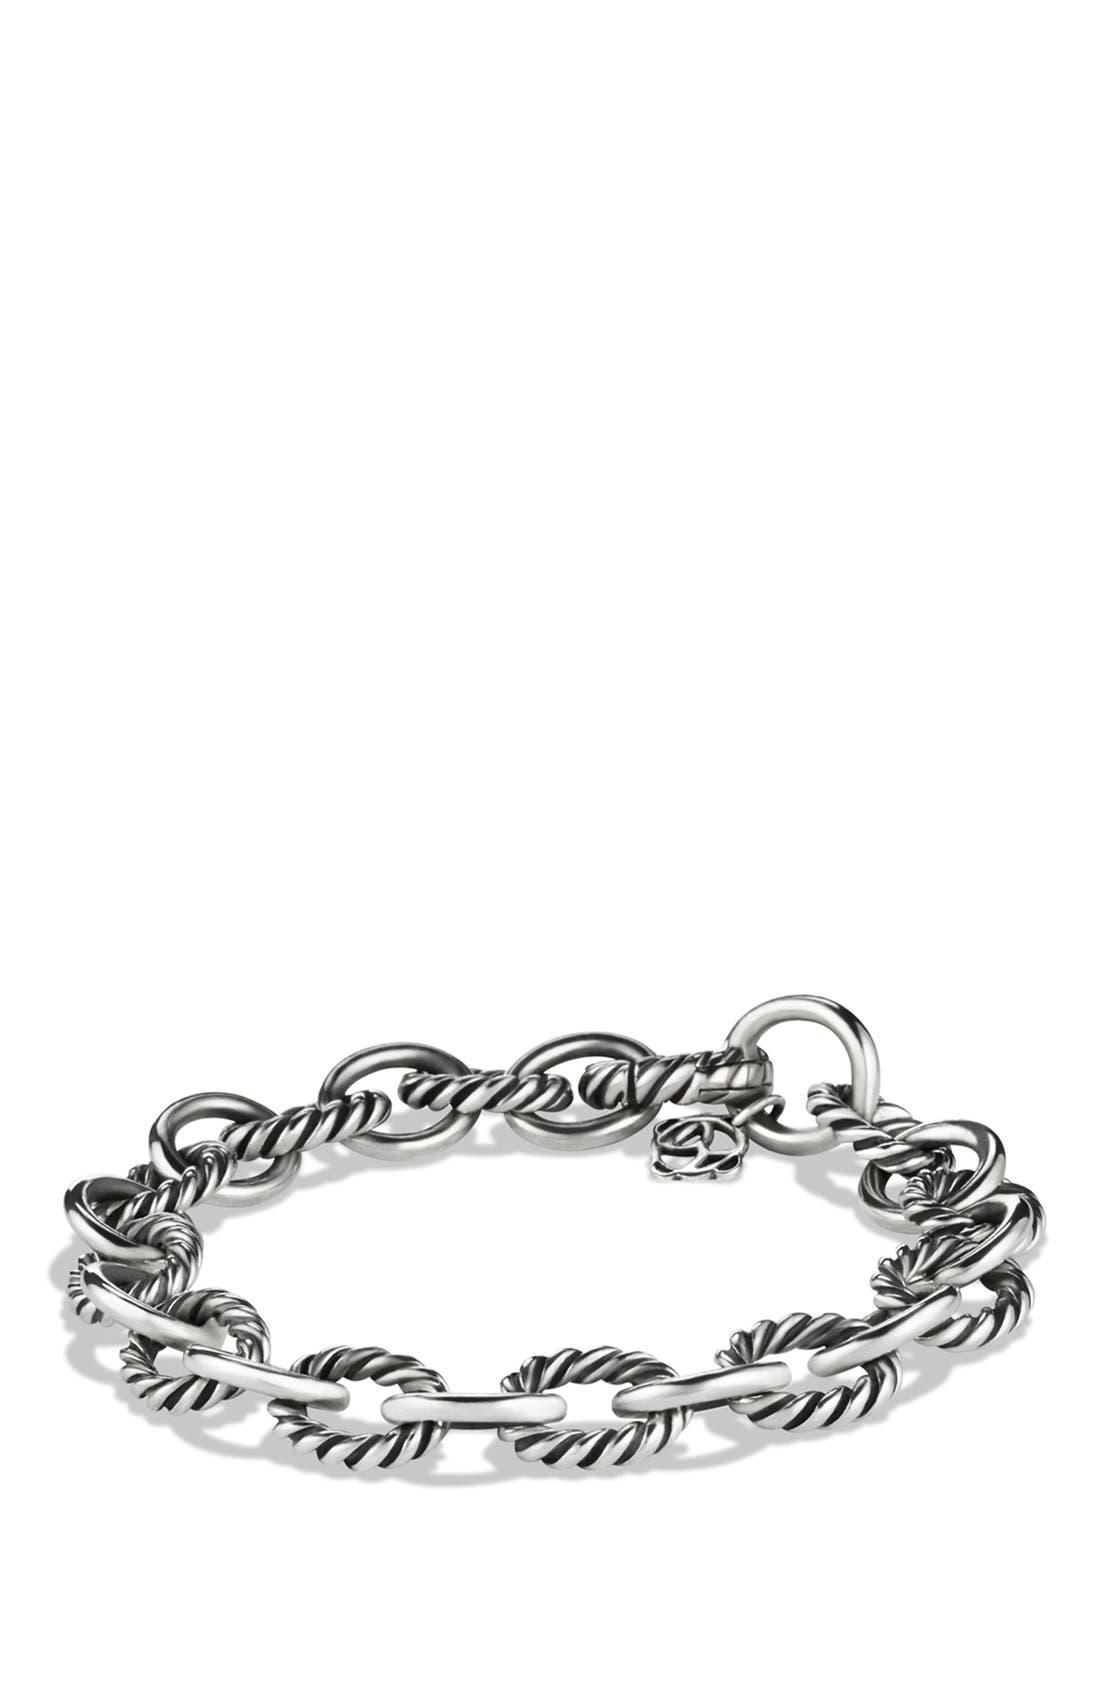 David Yurman 'Oval' Link Bracelet